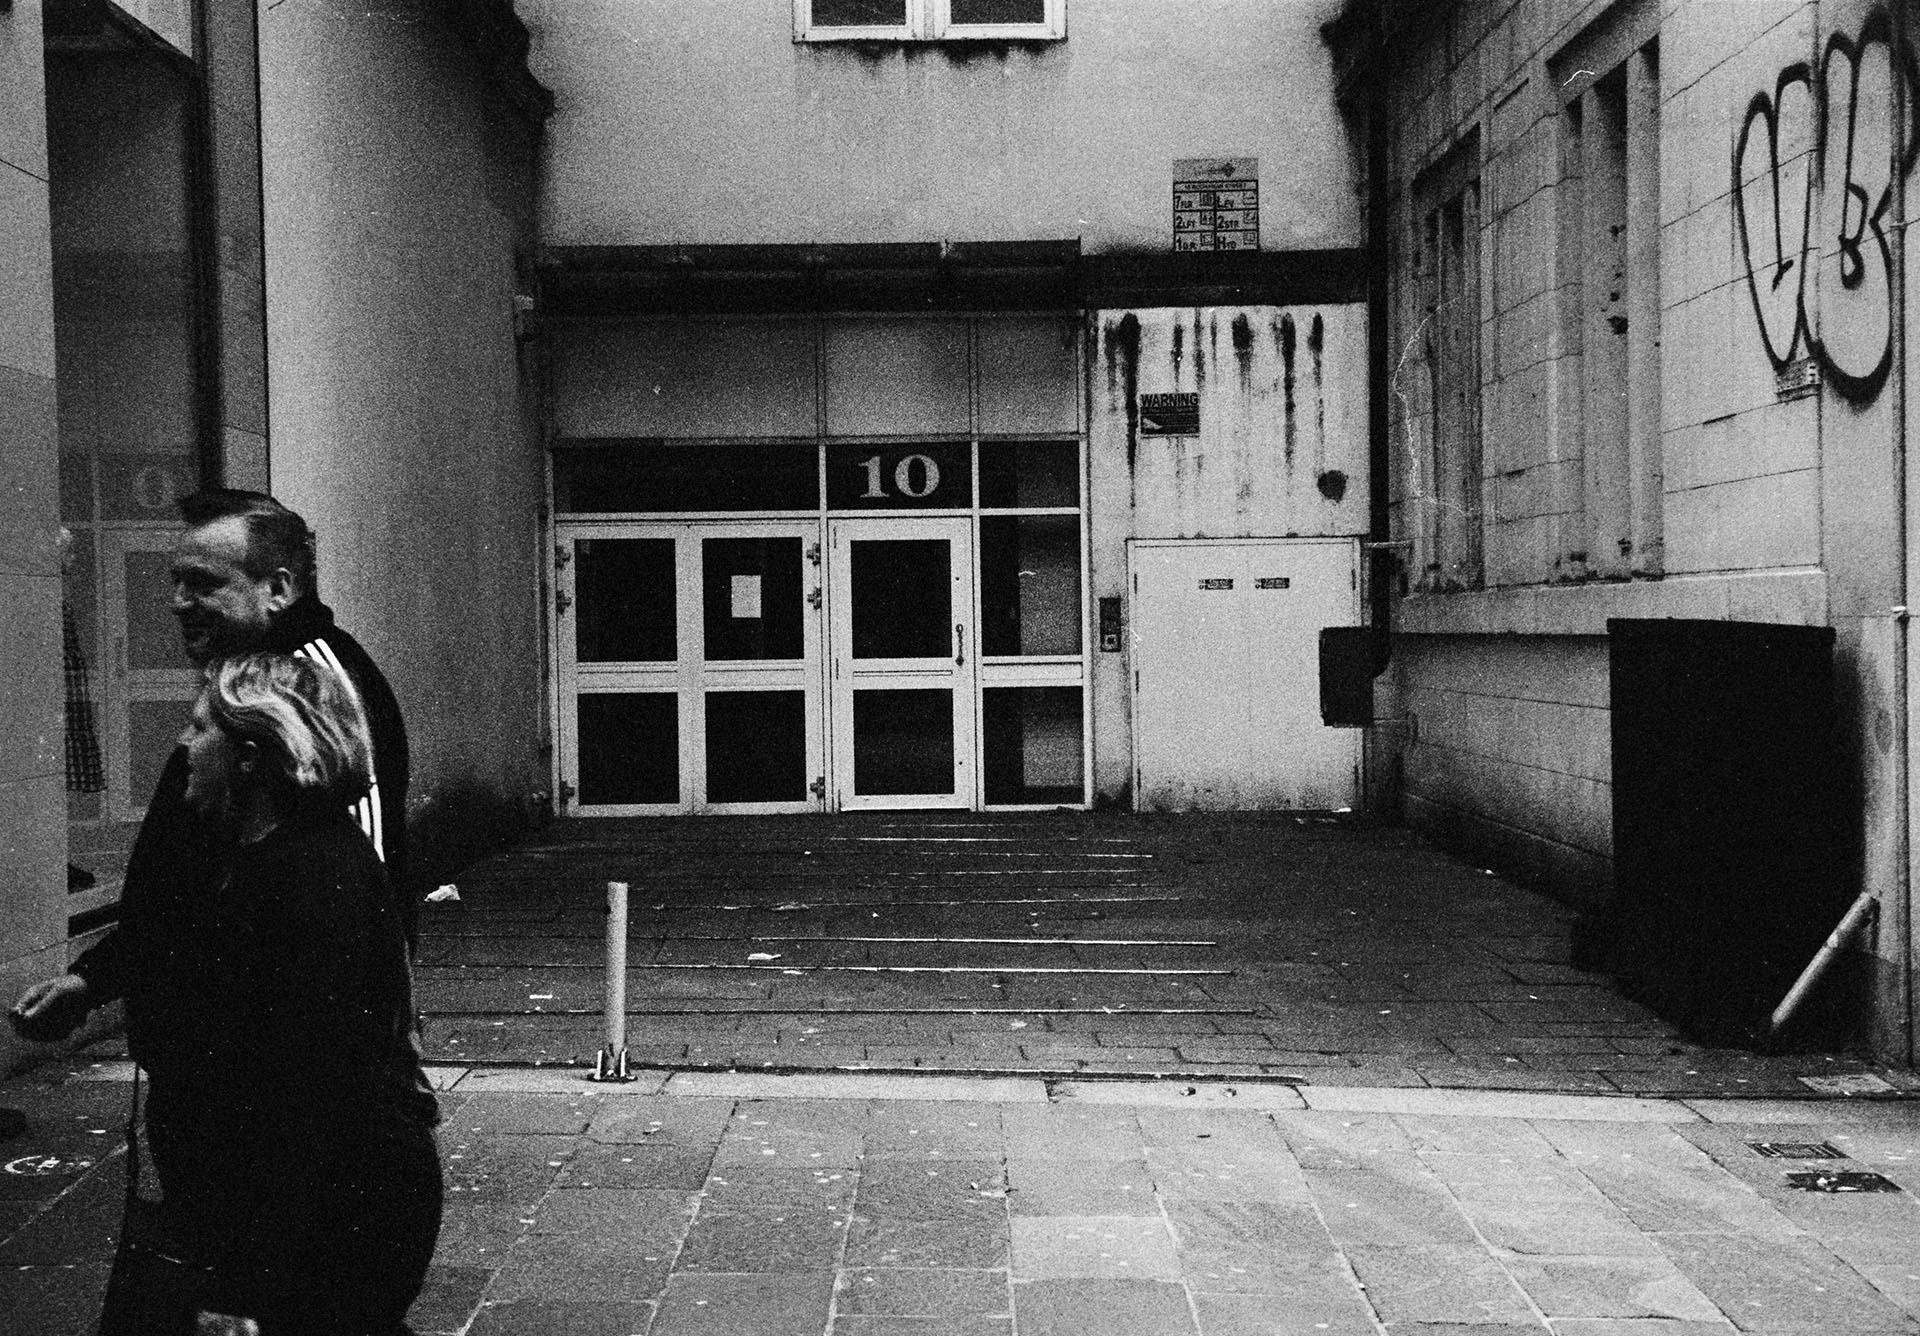 Glasgow 35mm street photography